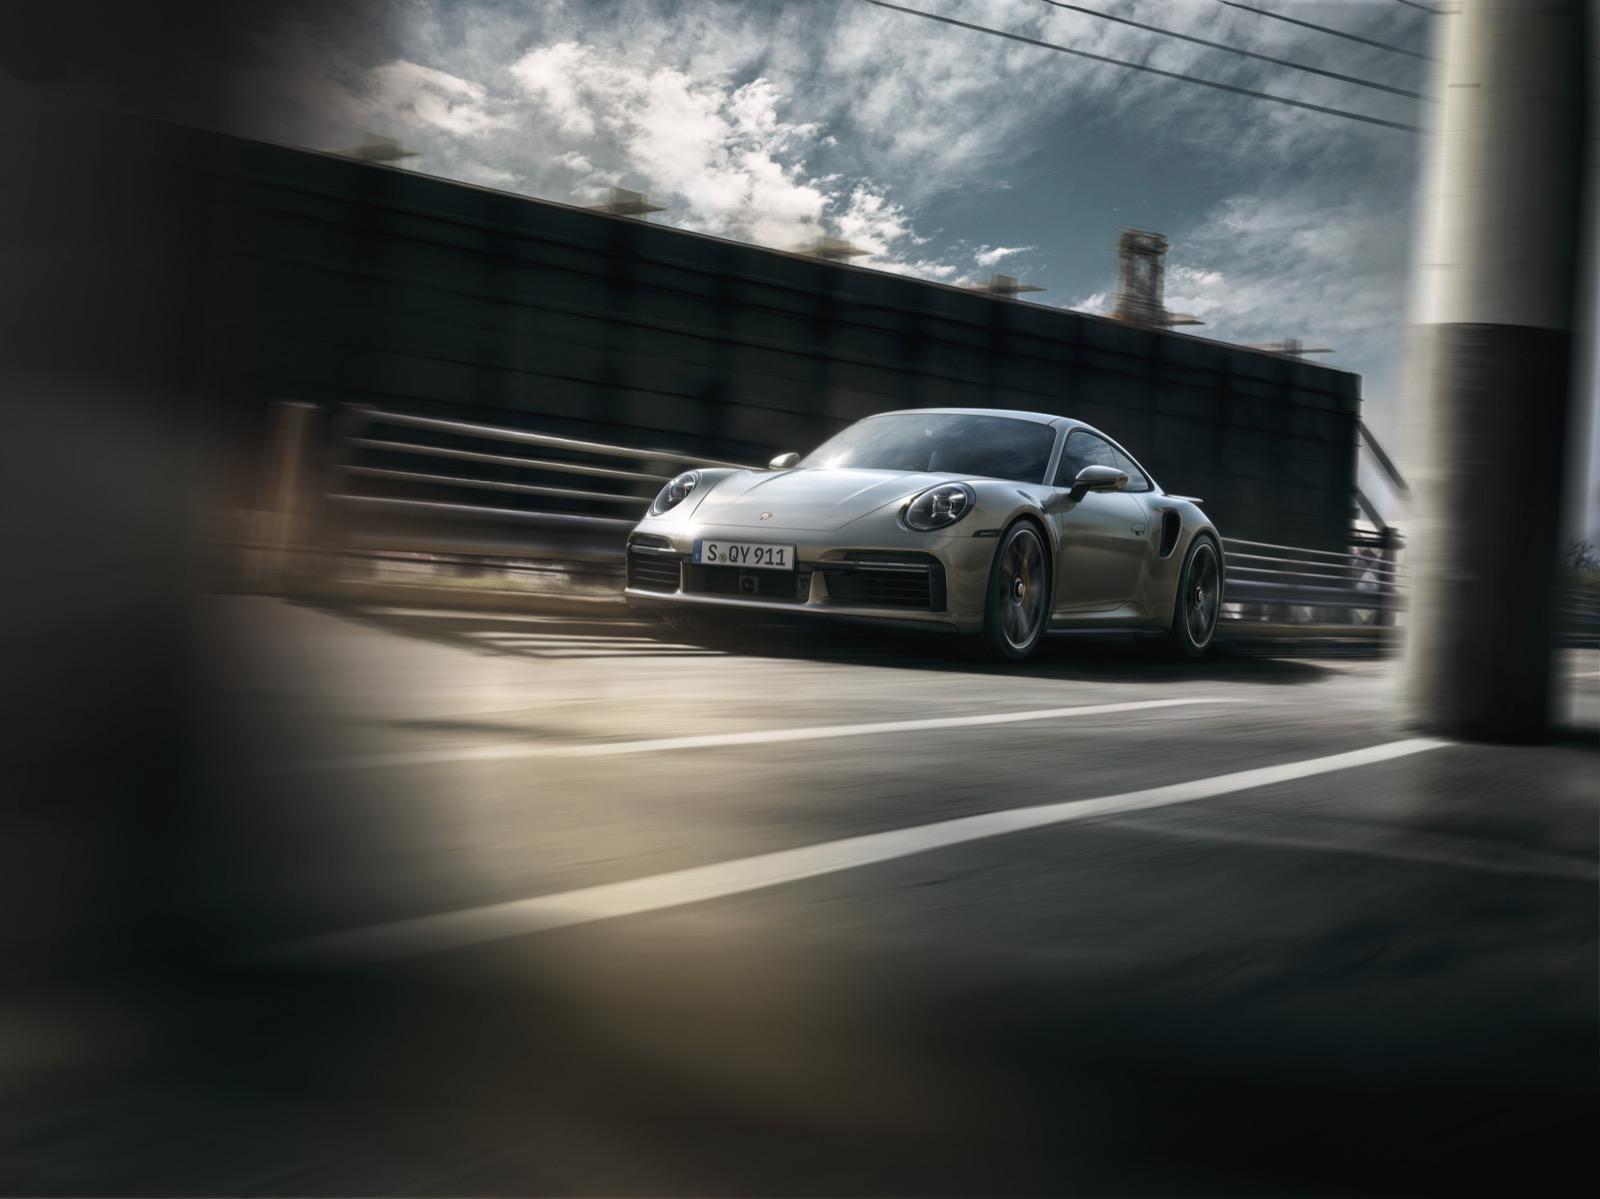 Porsche 911 Turbo 12